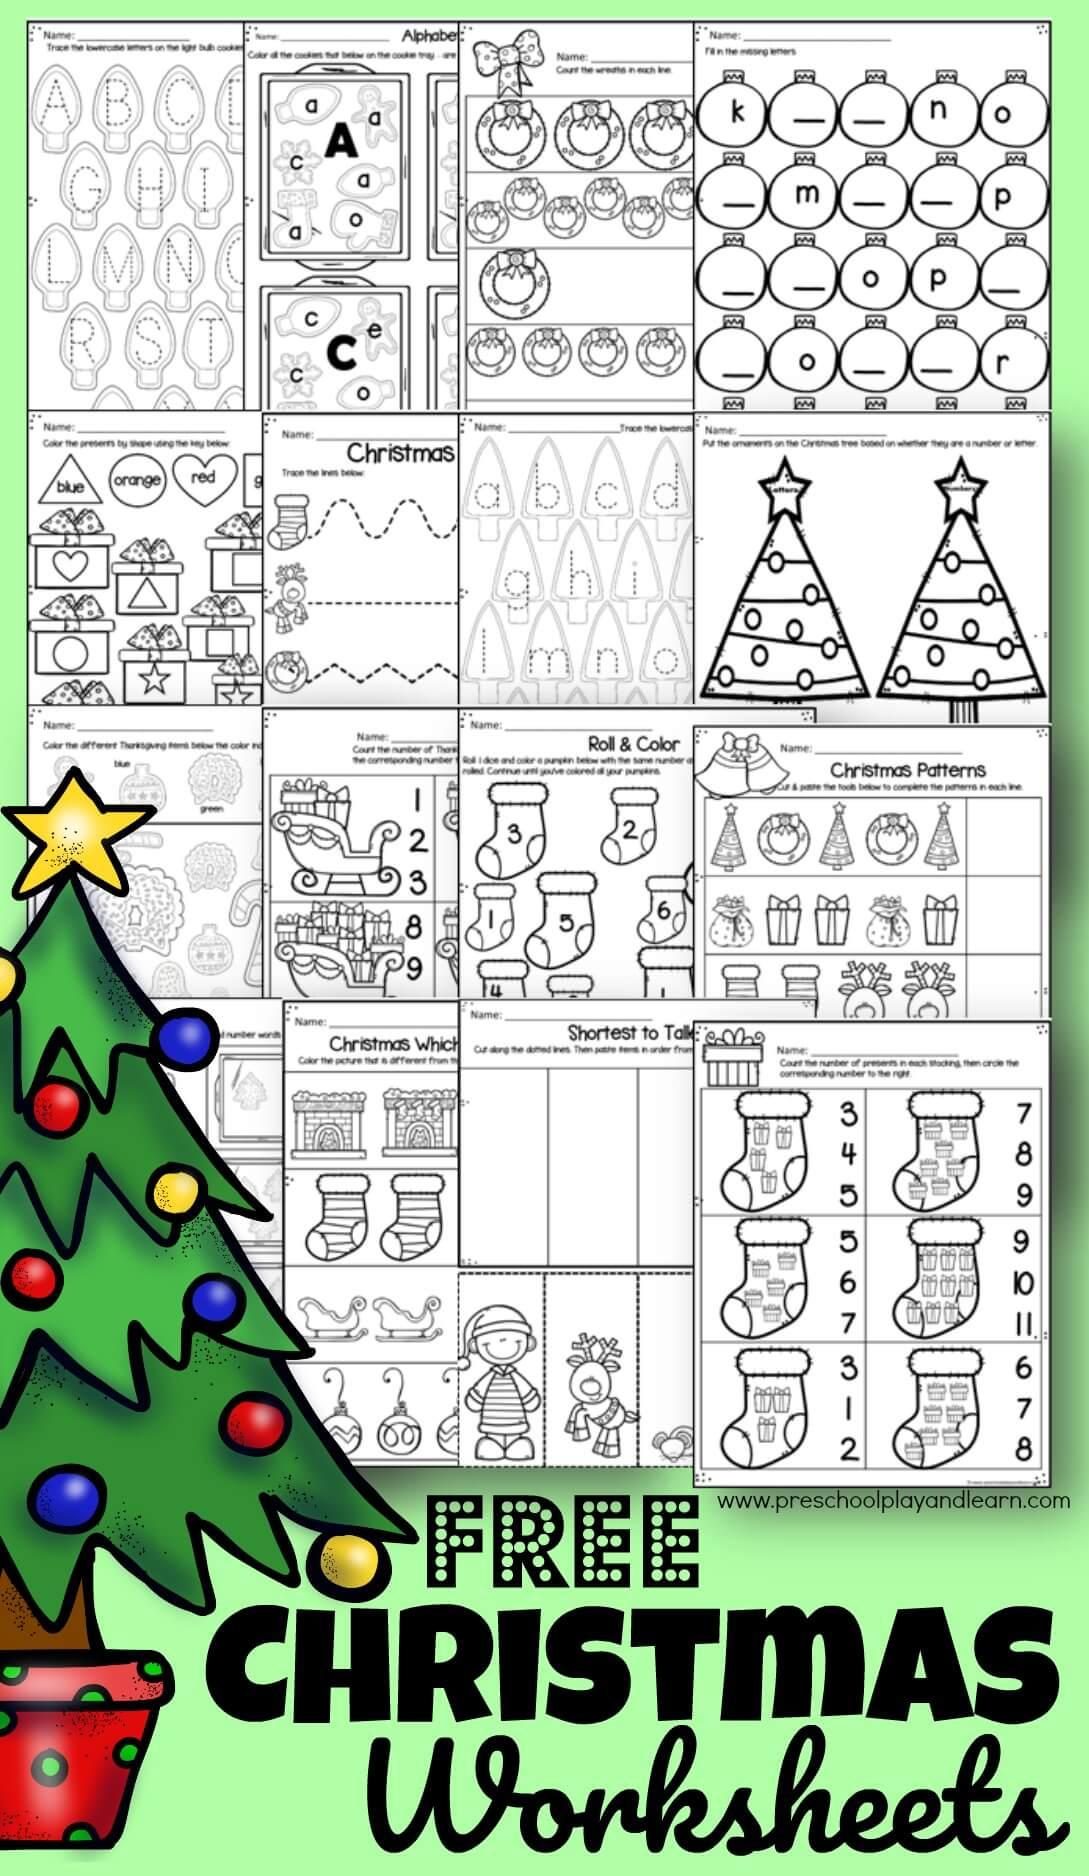 🎄 Free Christmas Worksheets For Preschool